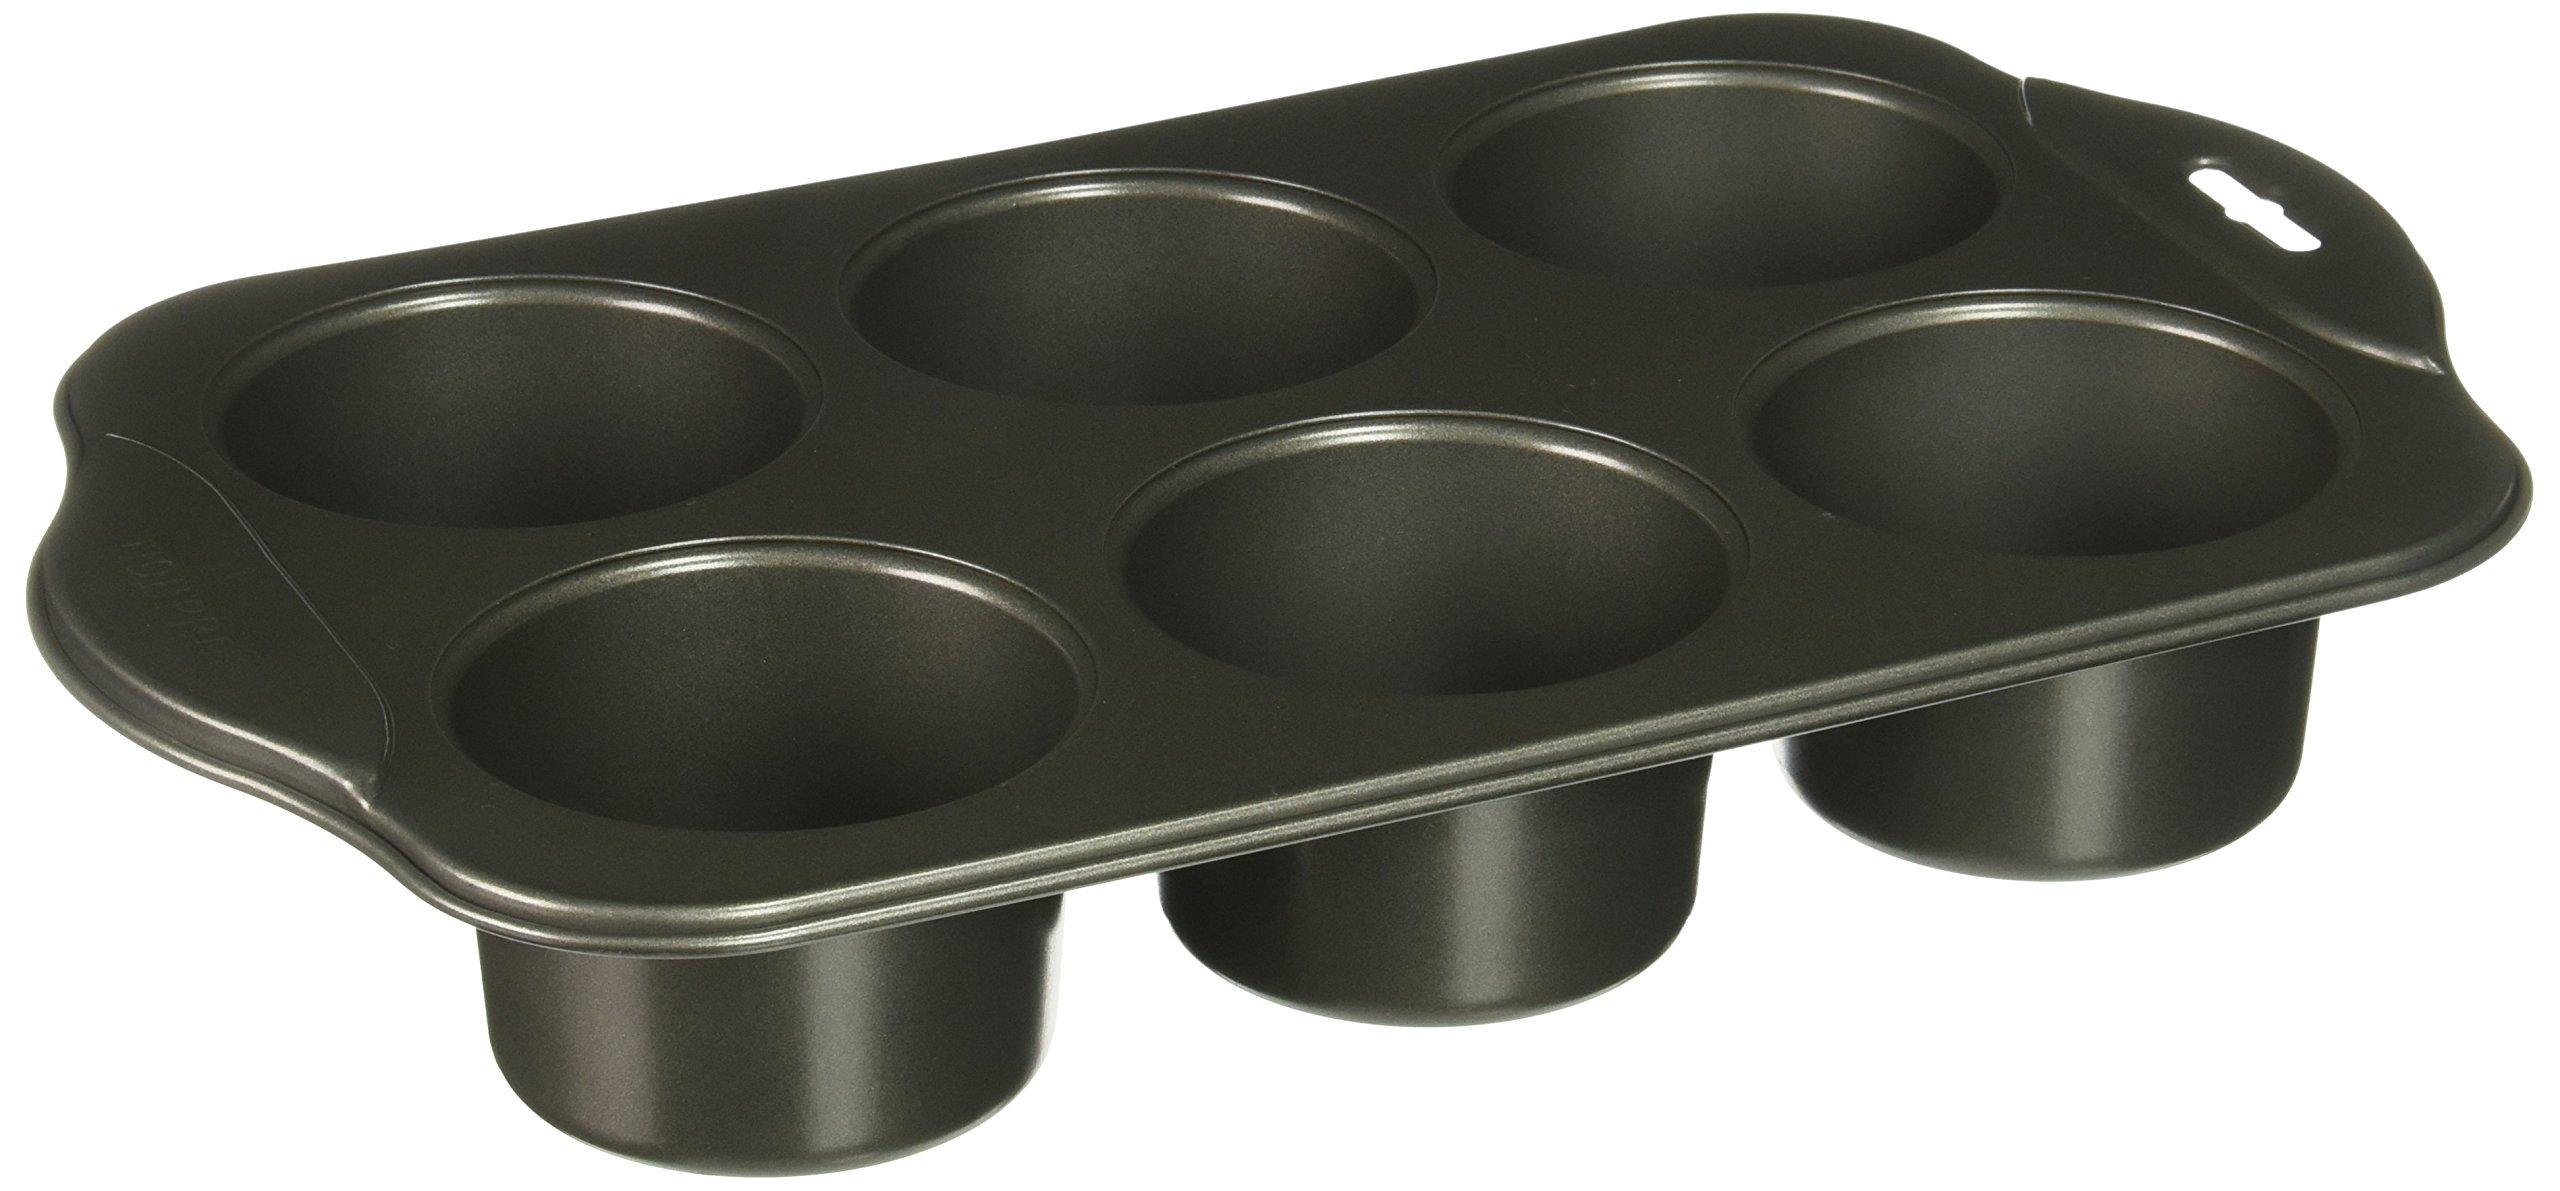 Norpro Nonstick 6 Cup Small Mini Cheesecake Muffin Cupcake Tart Quiche Pan New